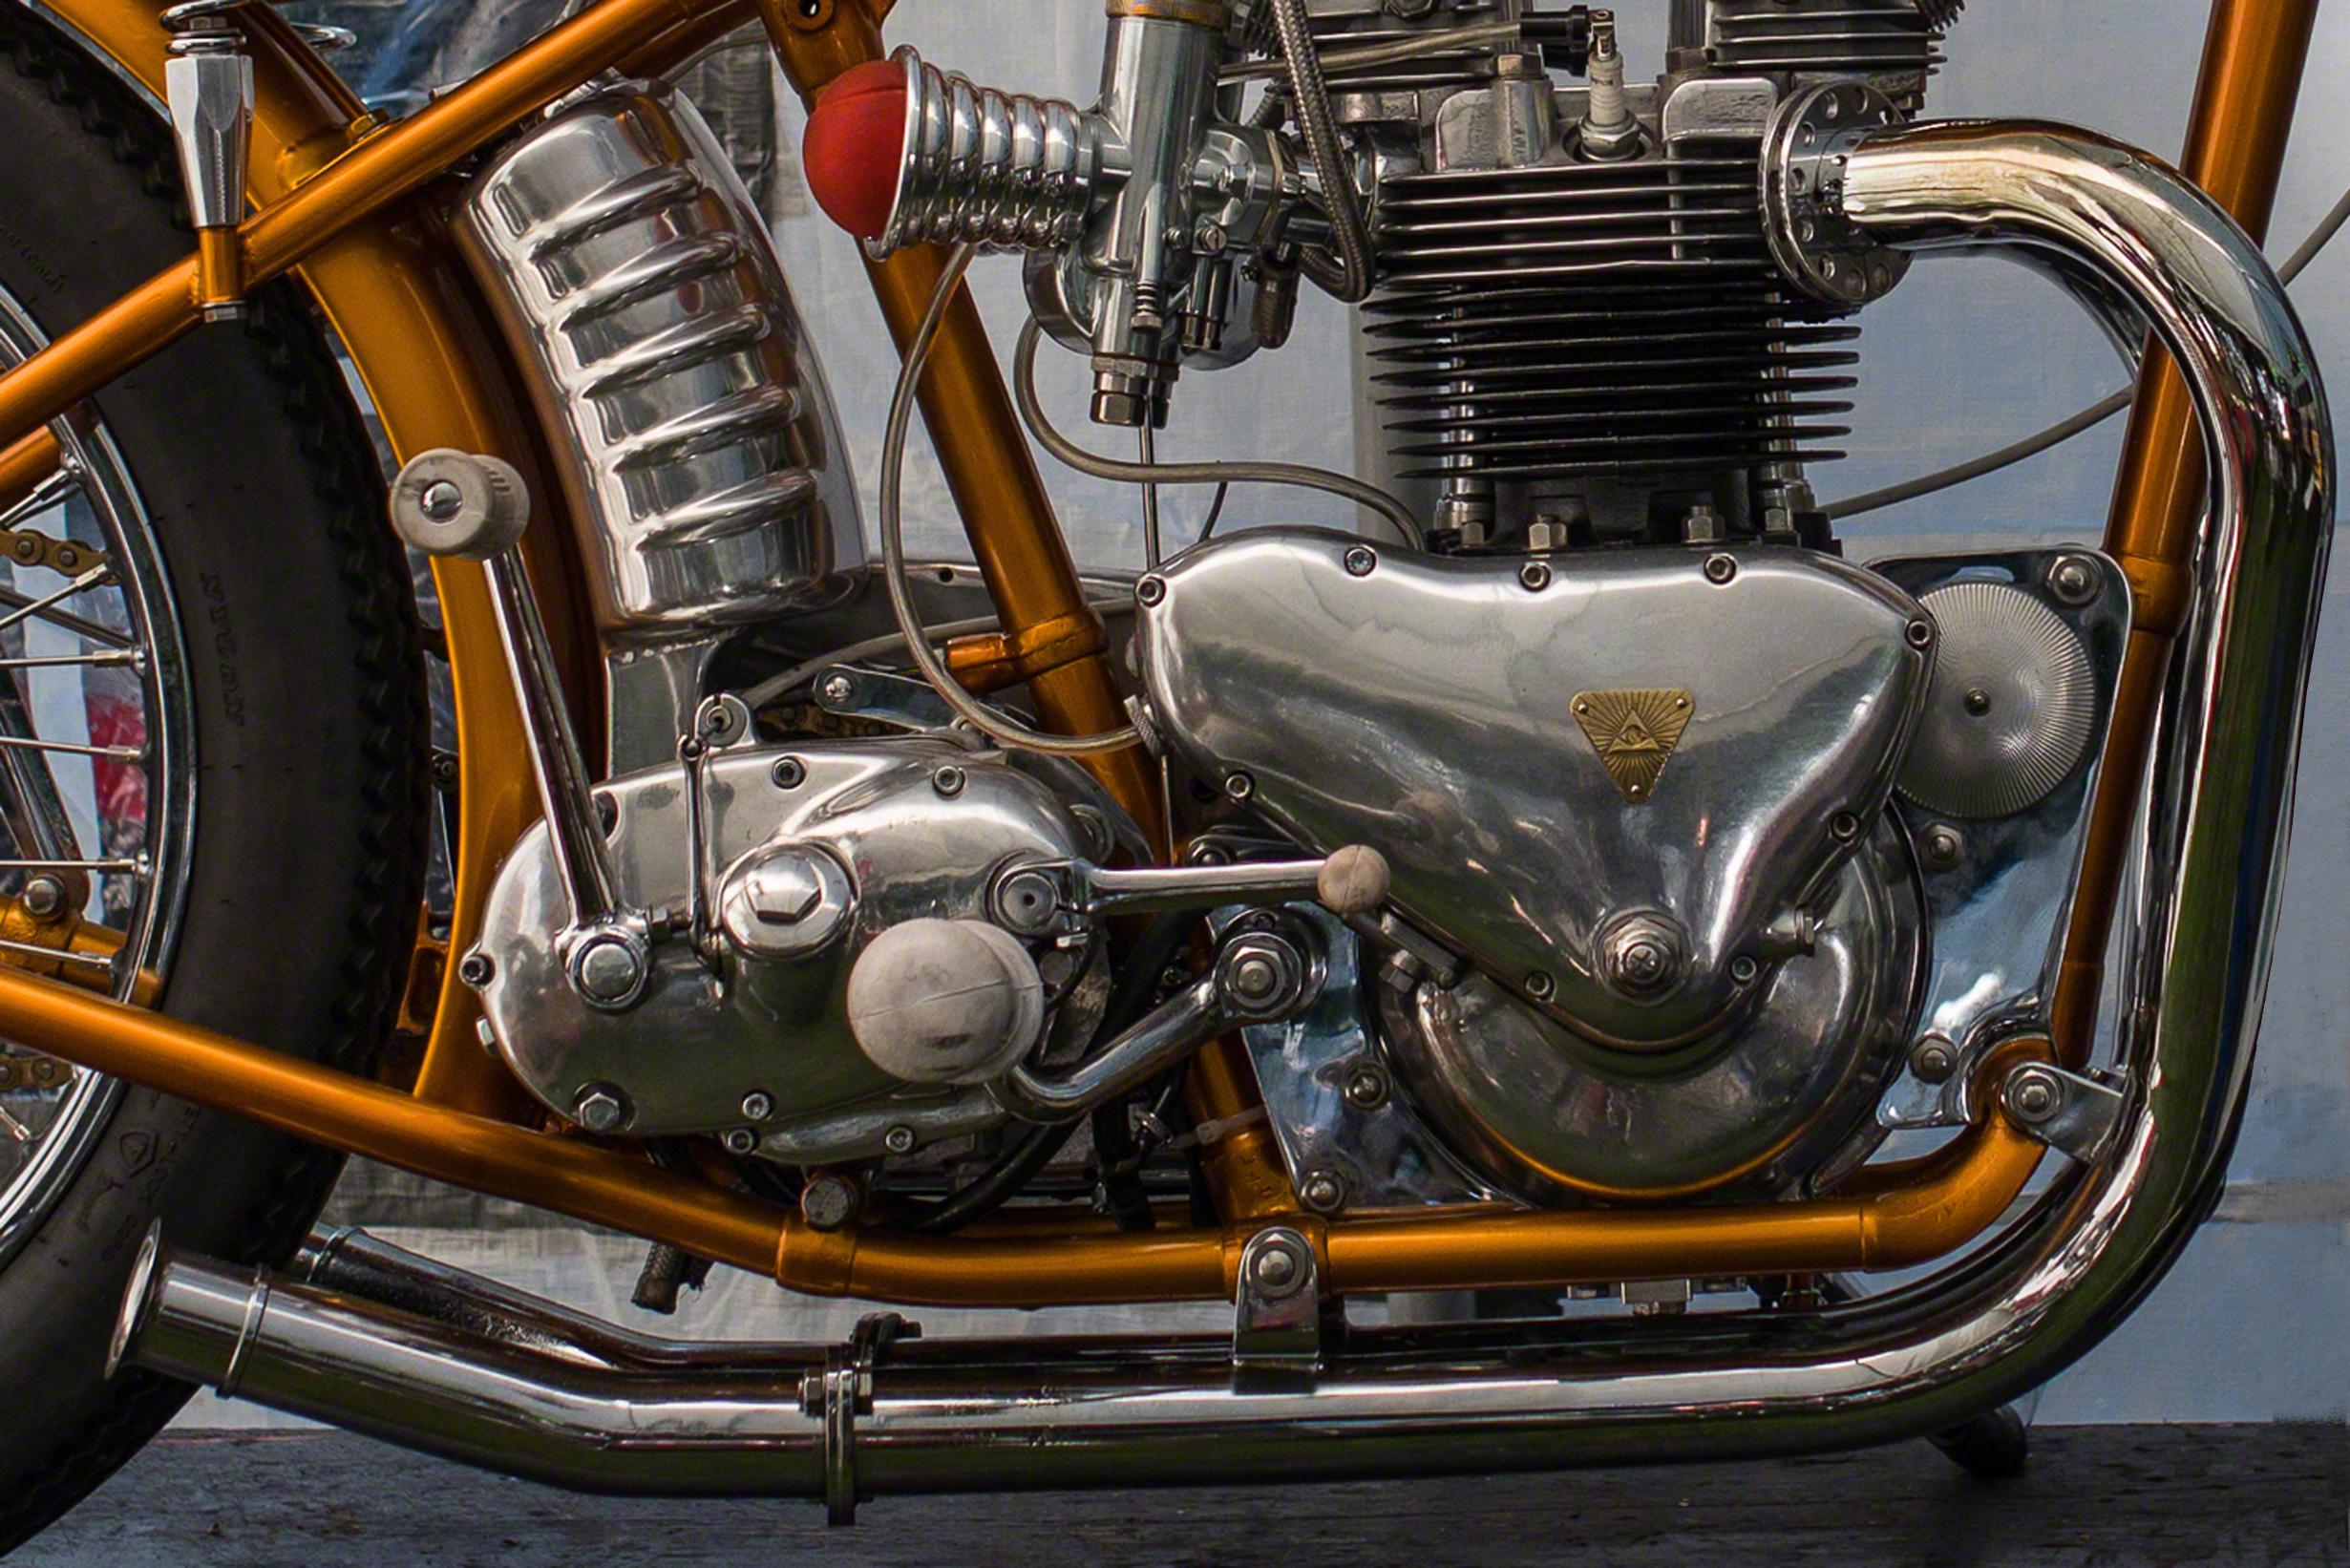 MotorTriumph-T100